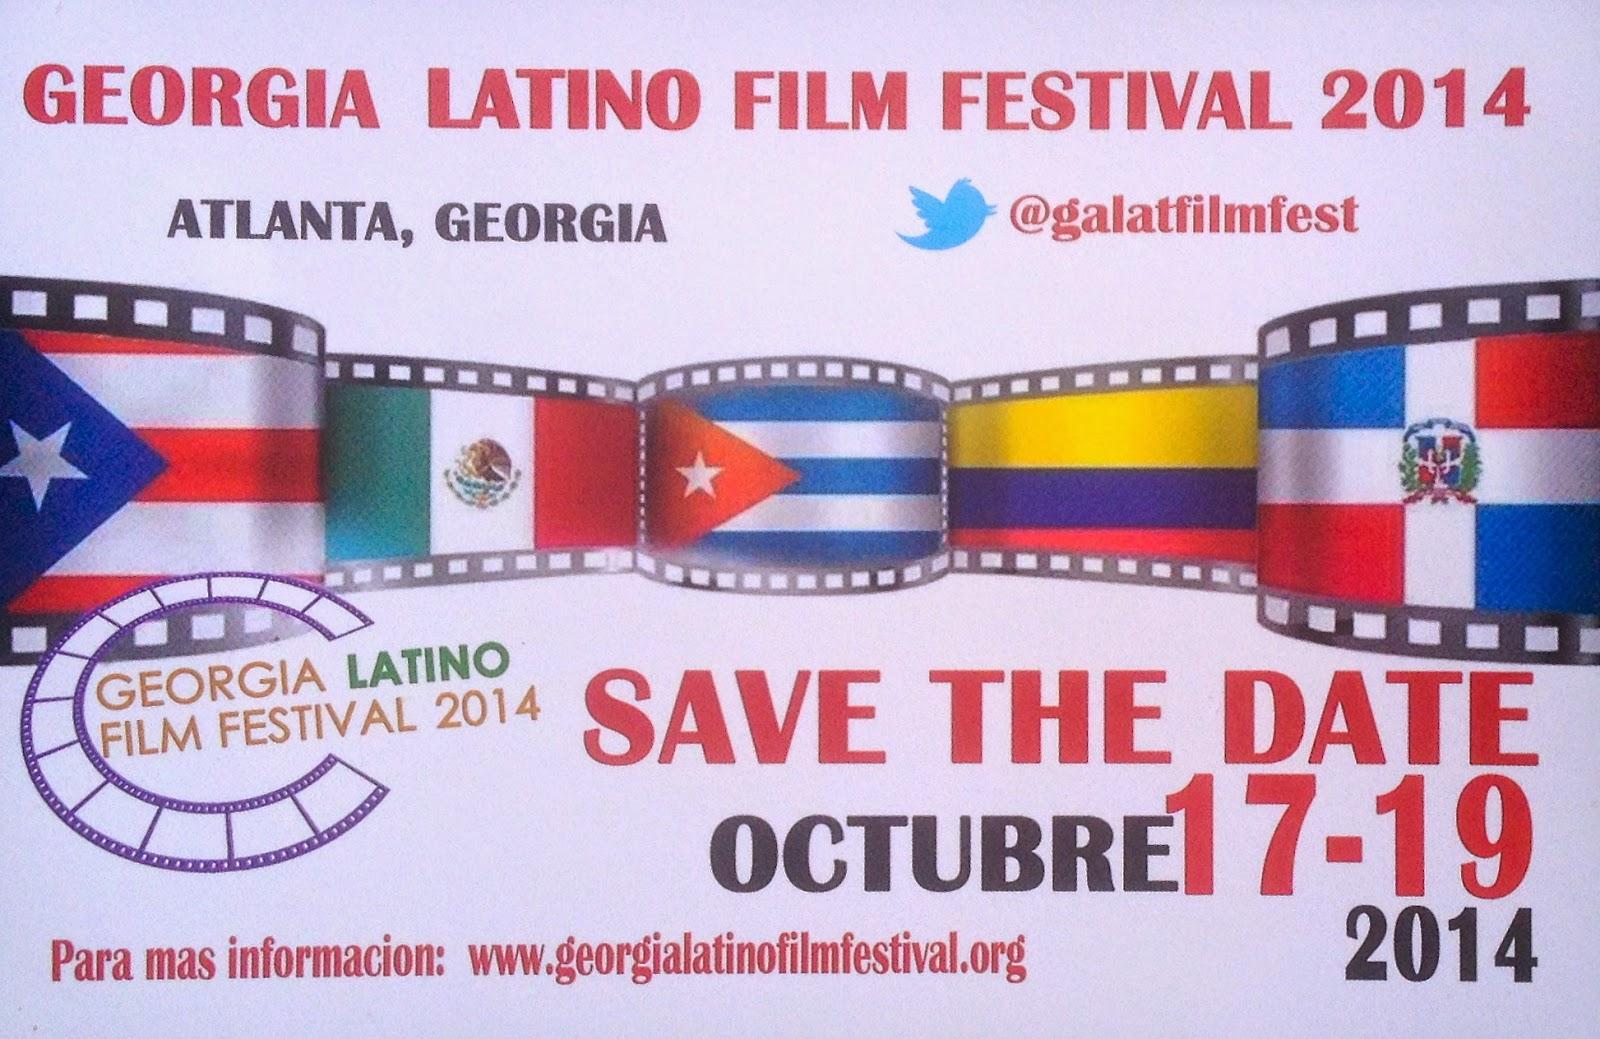 Georgia Latino Film Festival 2014